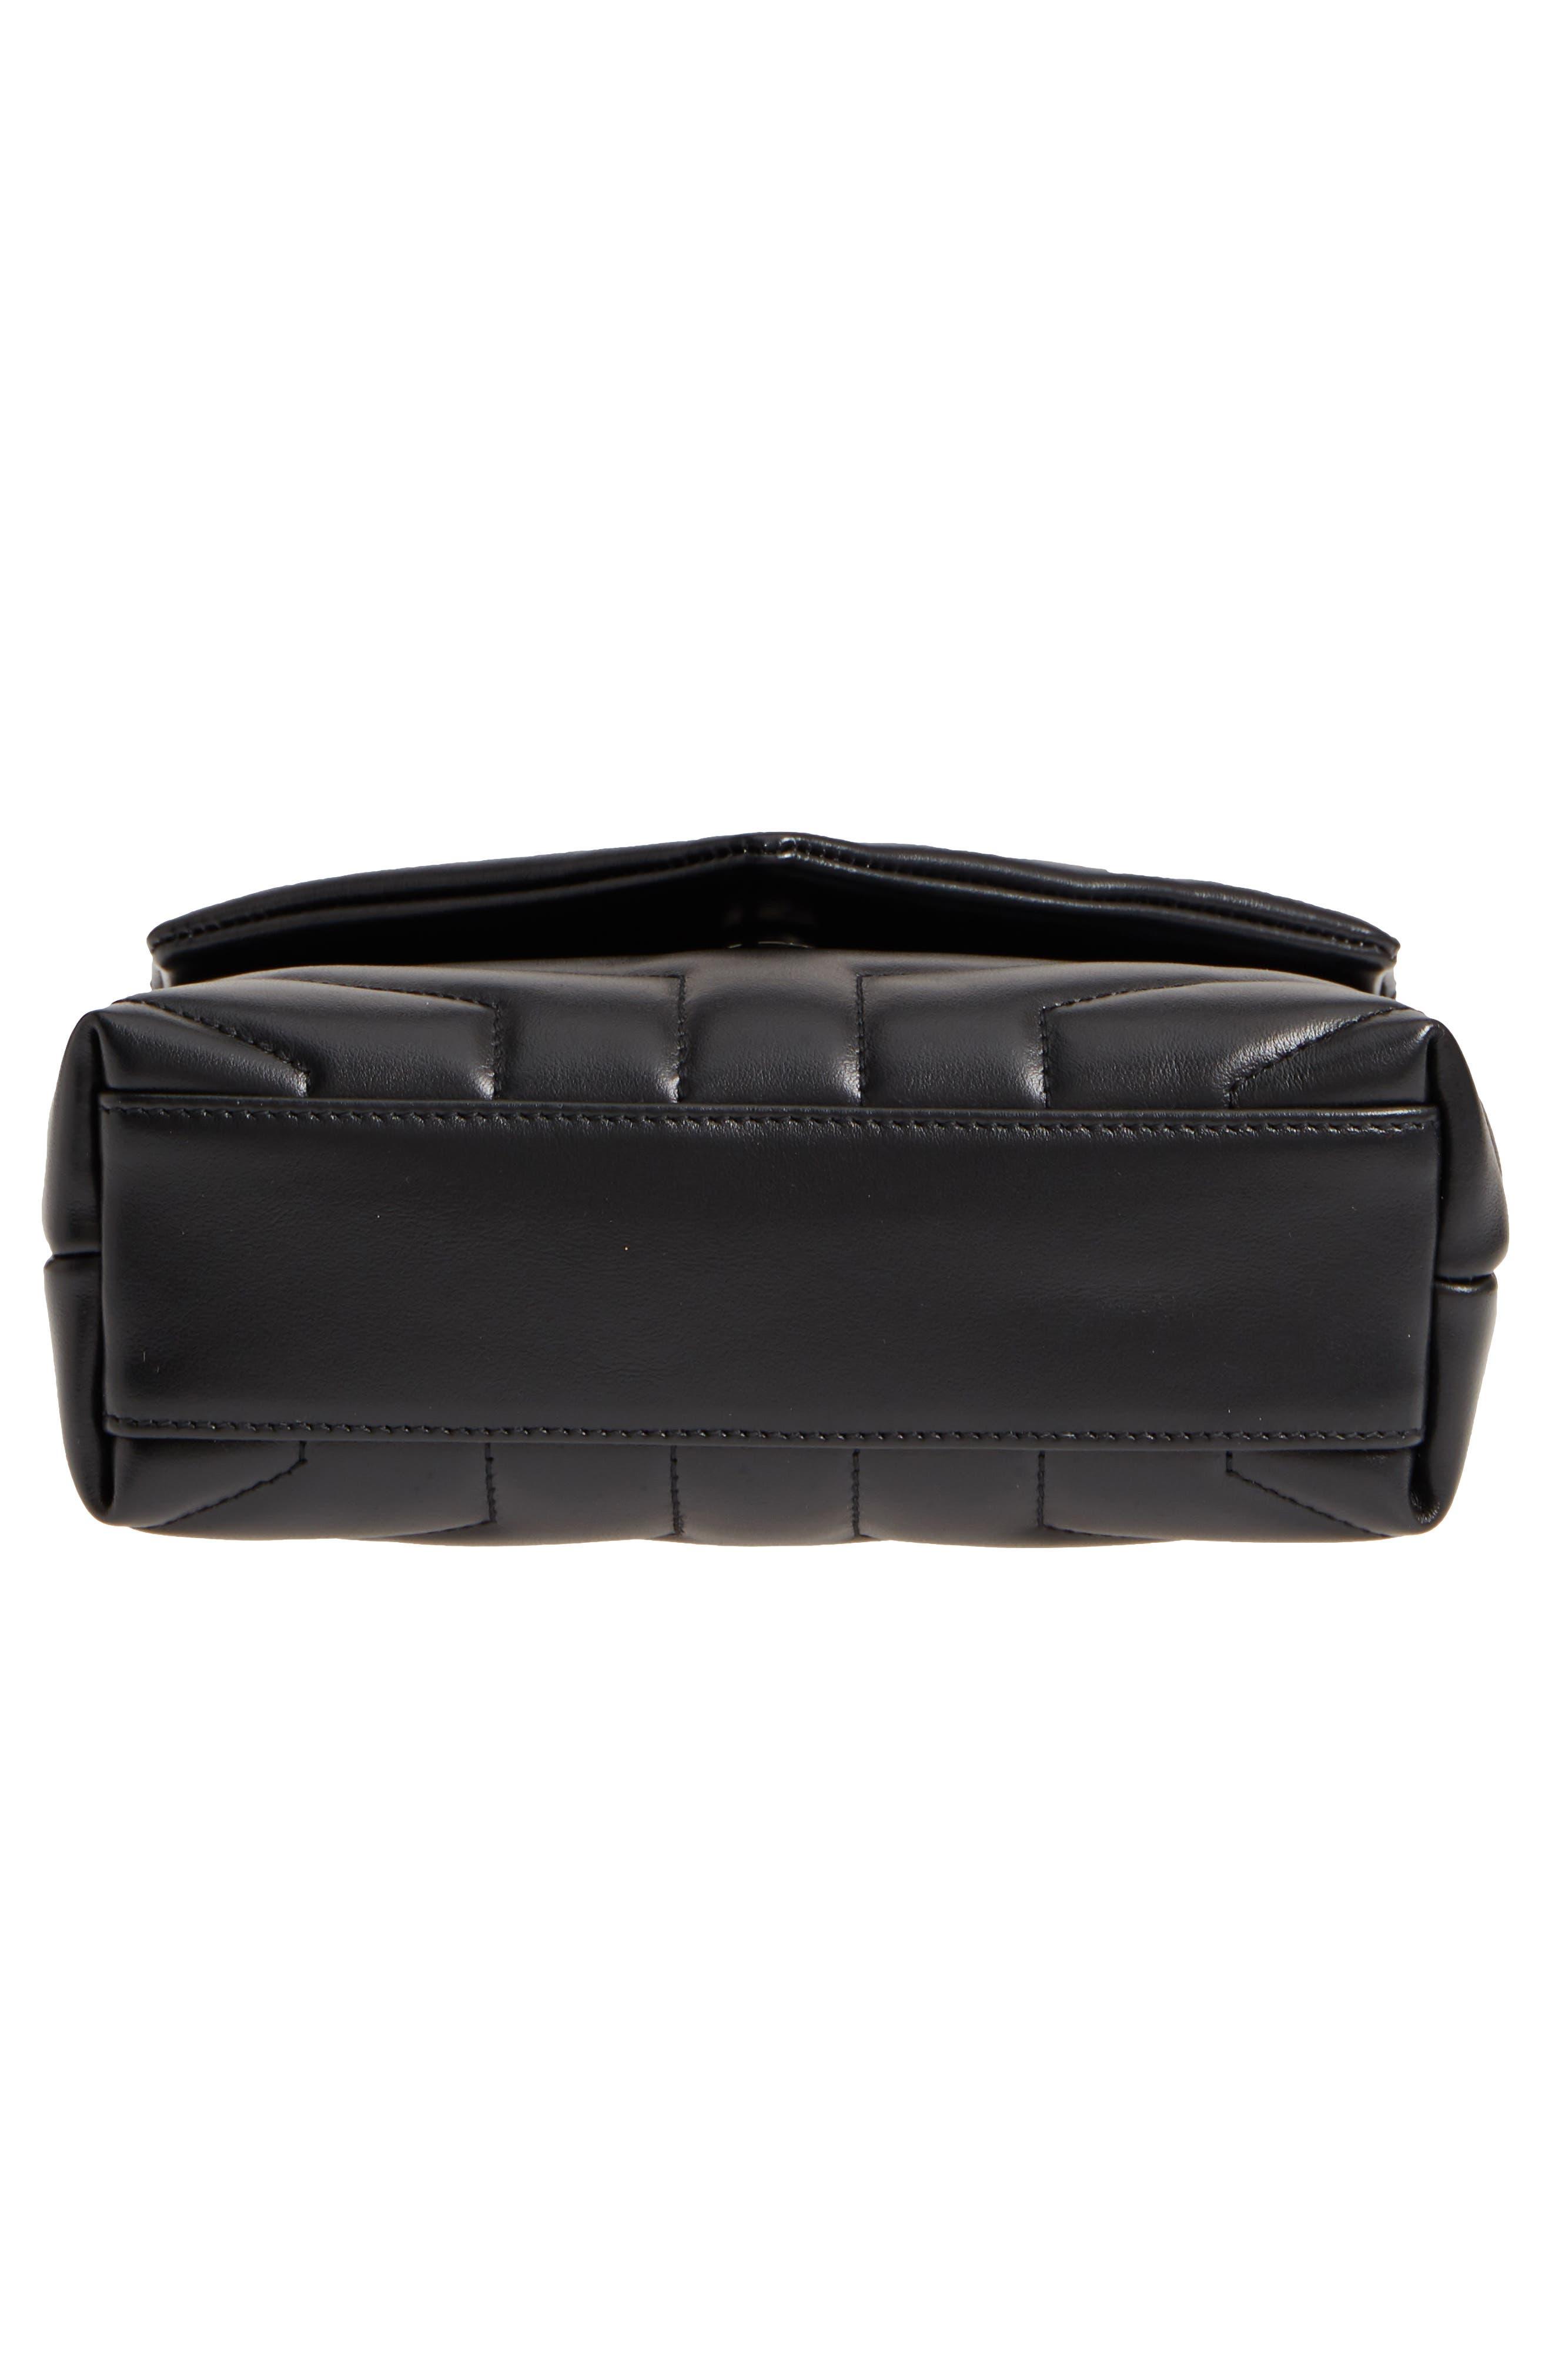 SAINT LAURENT, Toy Loulou Leather Crossbody Bag, Alternate thumbnail 6, color, 001